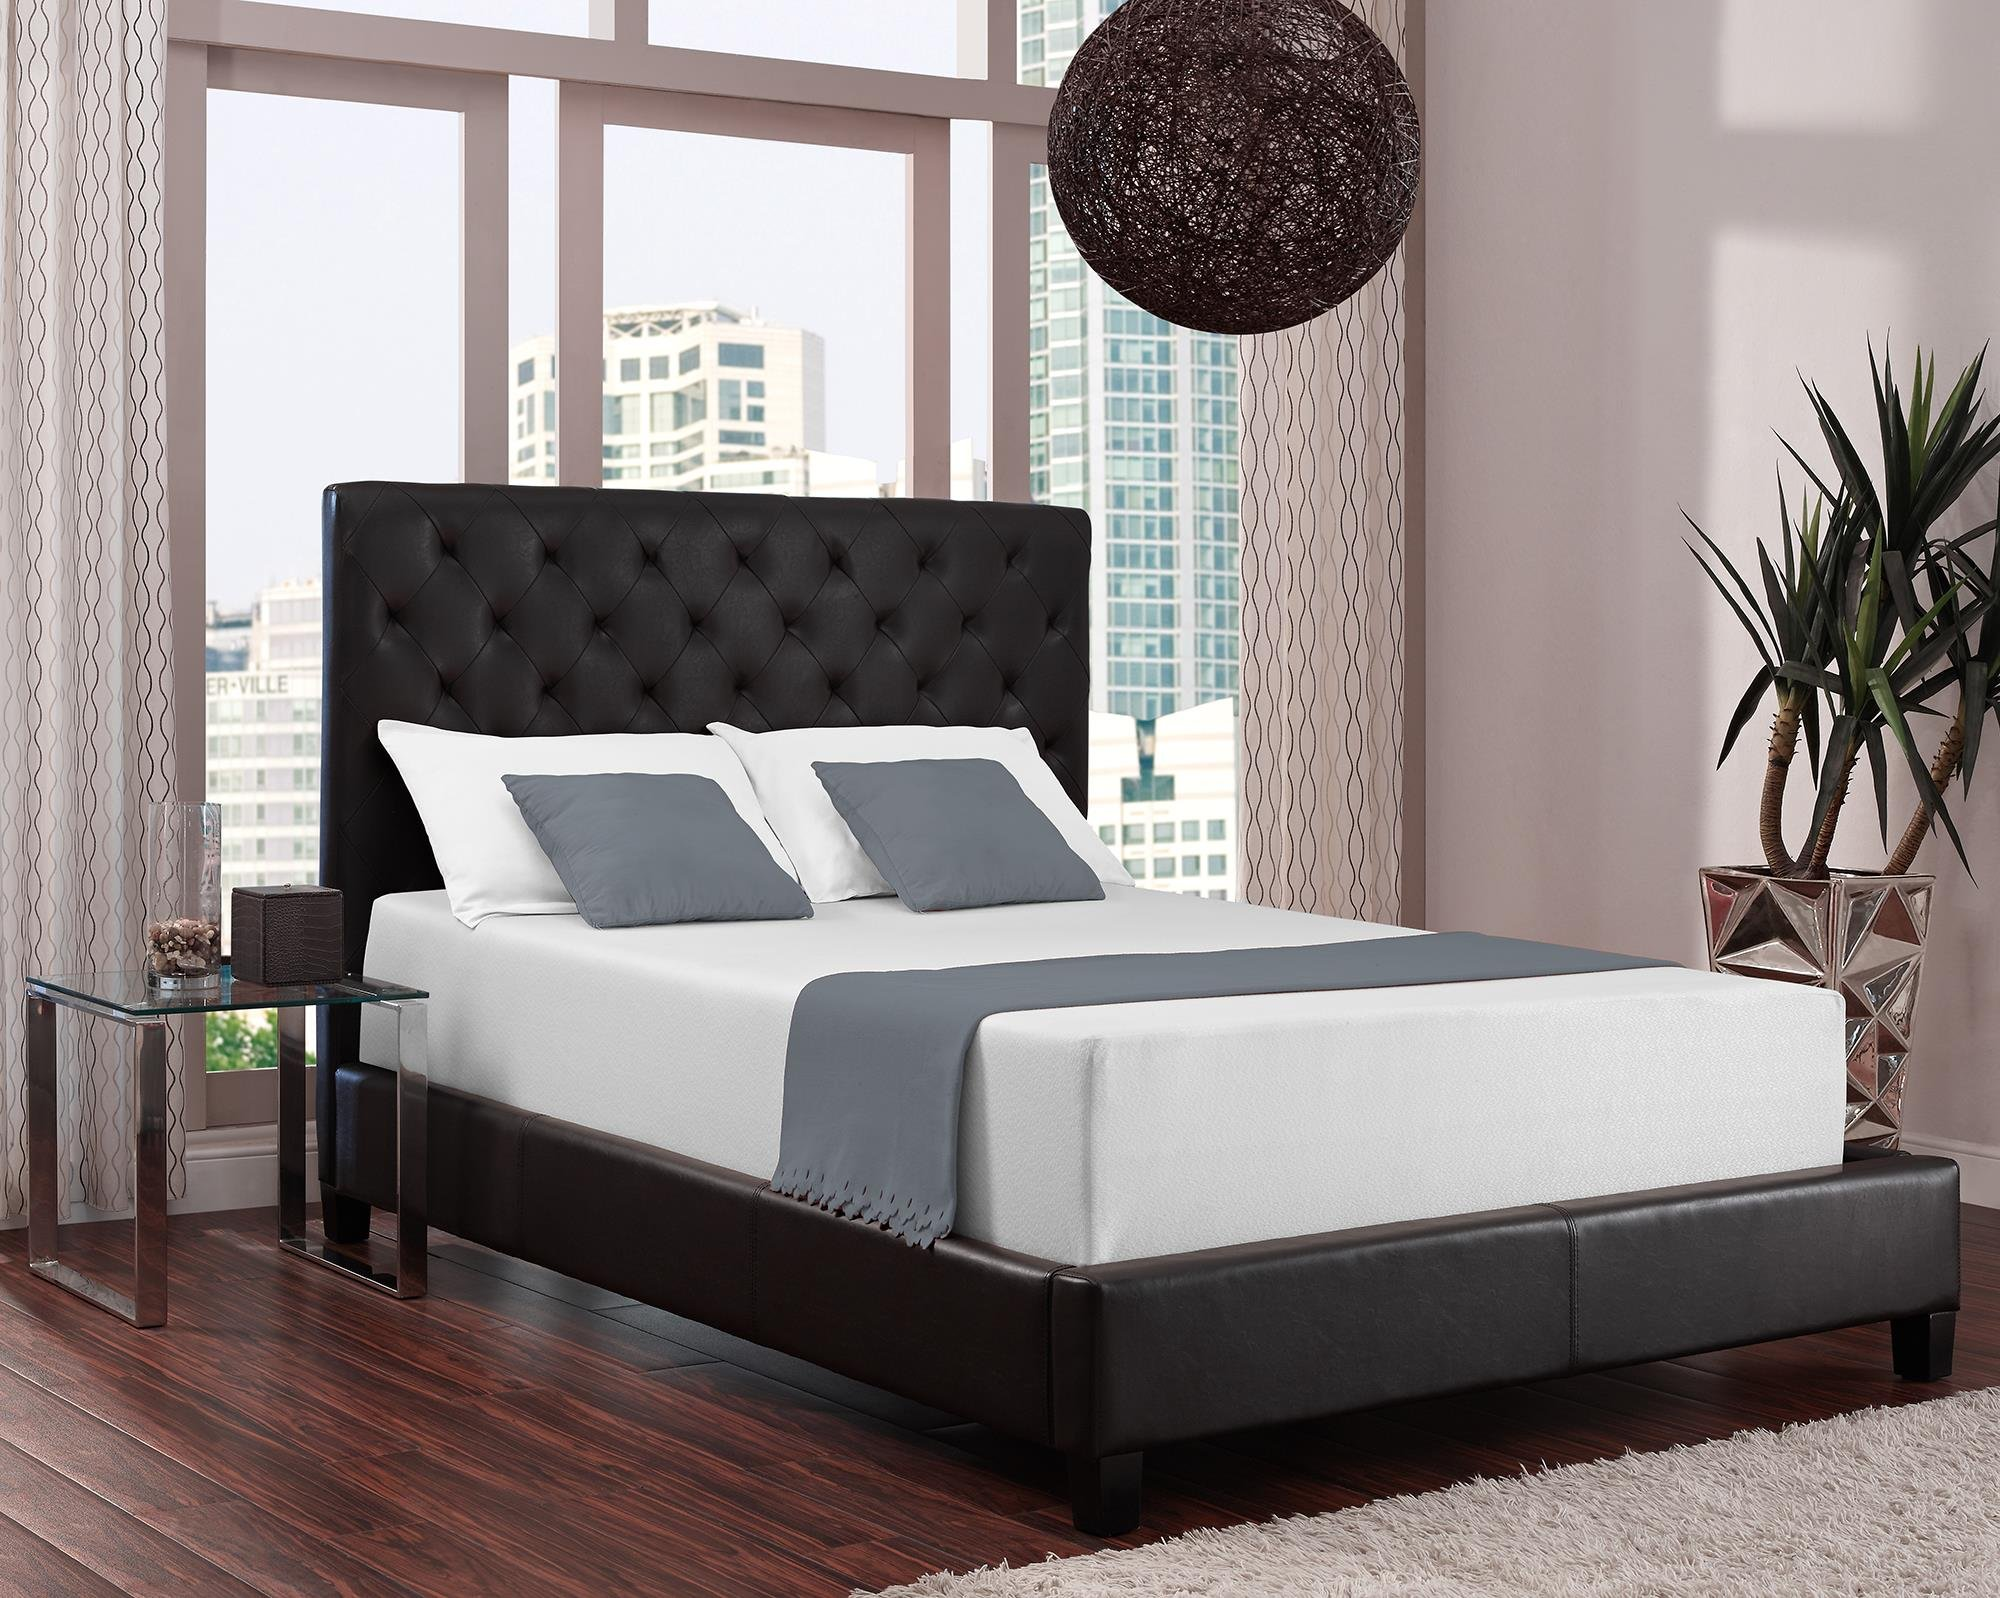 Signature Sleep Memoir 12 Inch Memory Foam Mattress with CertiPUR-US certified foam, Full